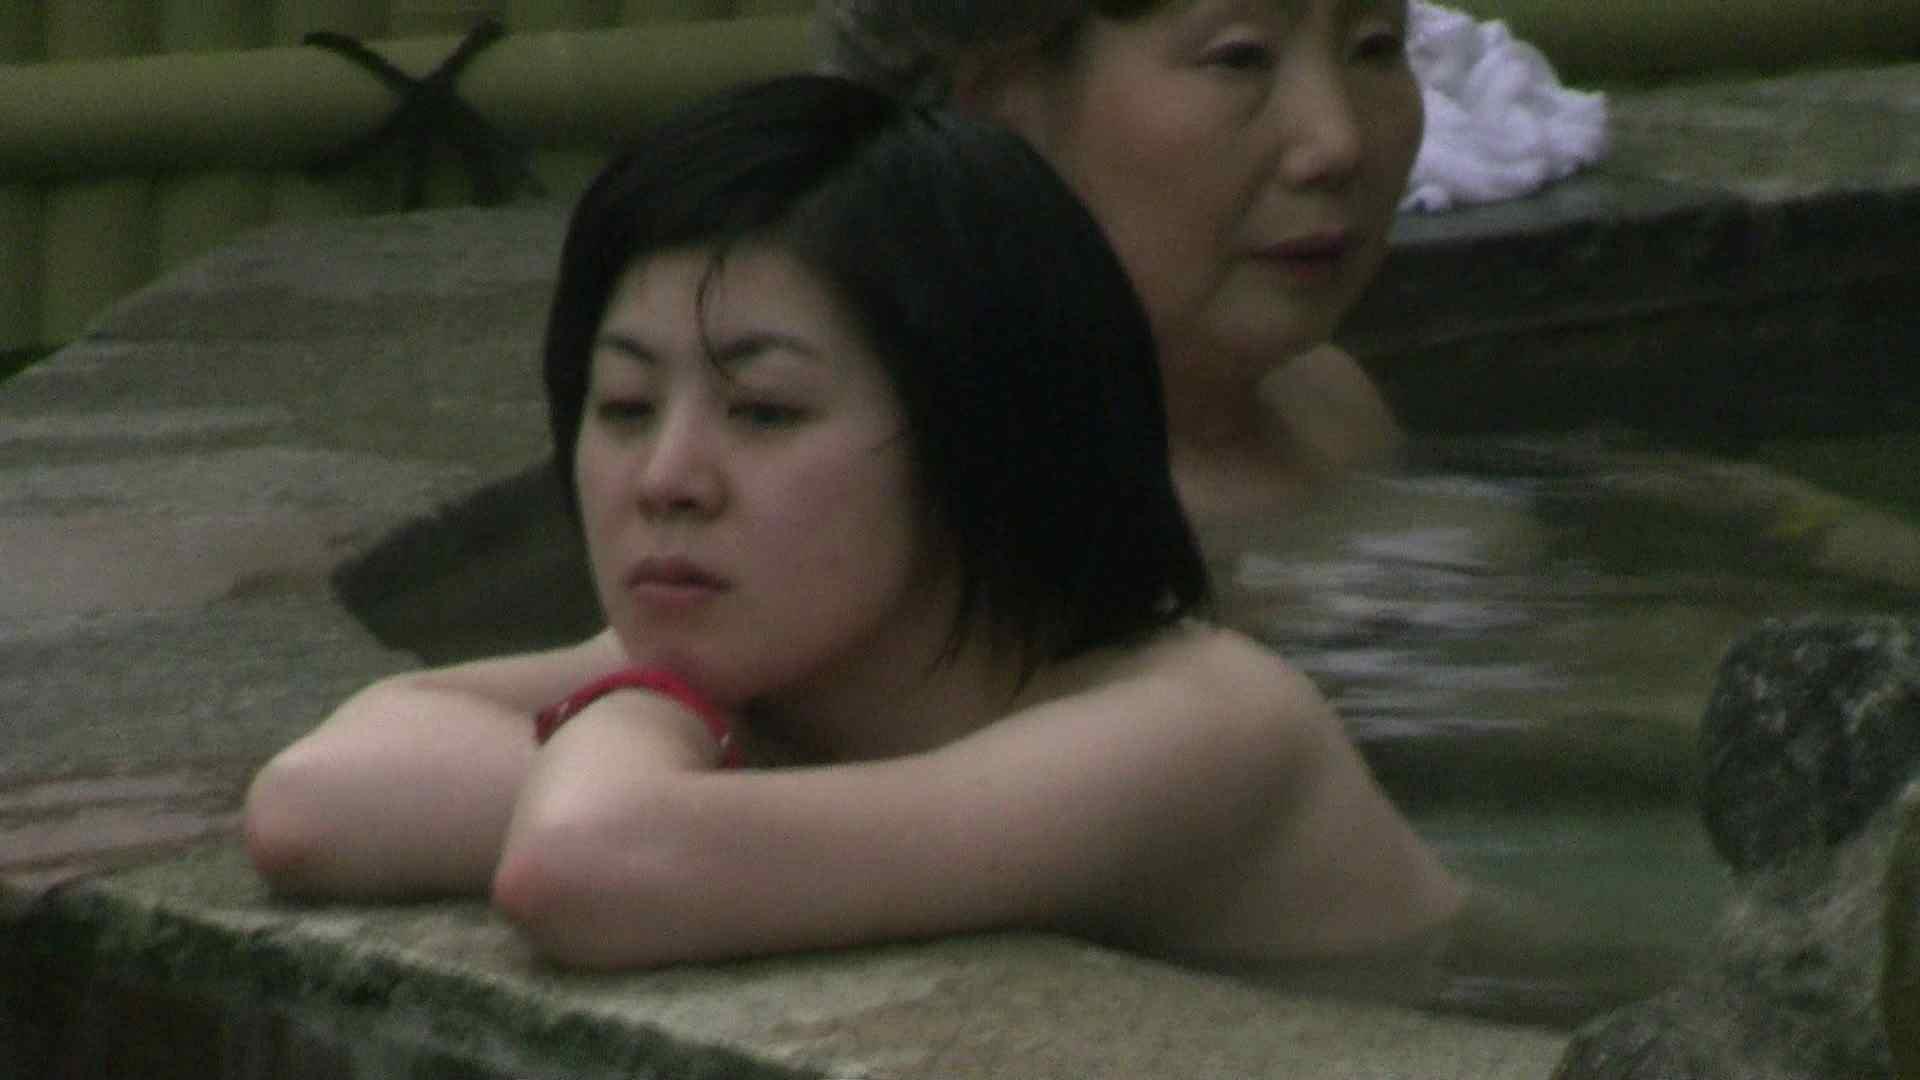 Aquaな露天風呂Vol.685 盗撮シリーズ | 露天風呂編  95PIX 7